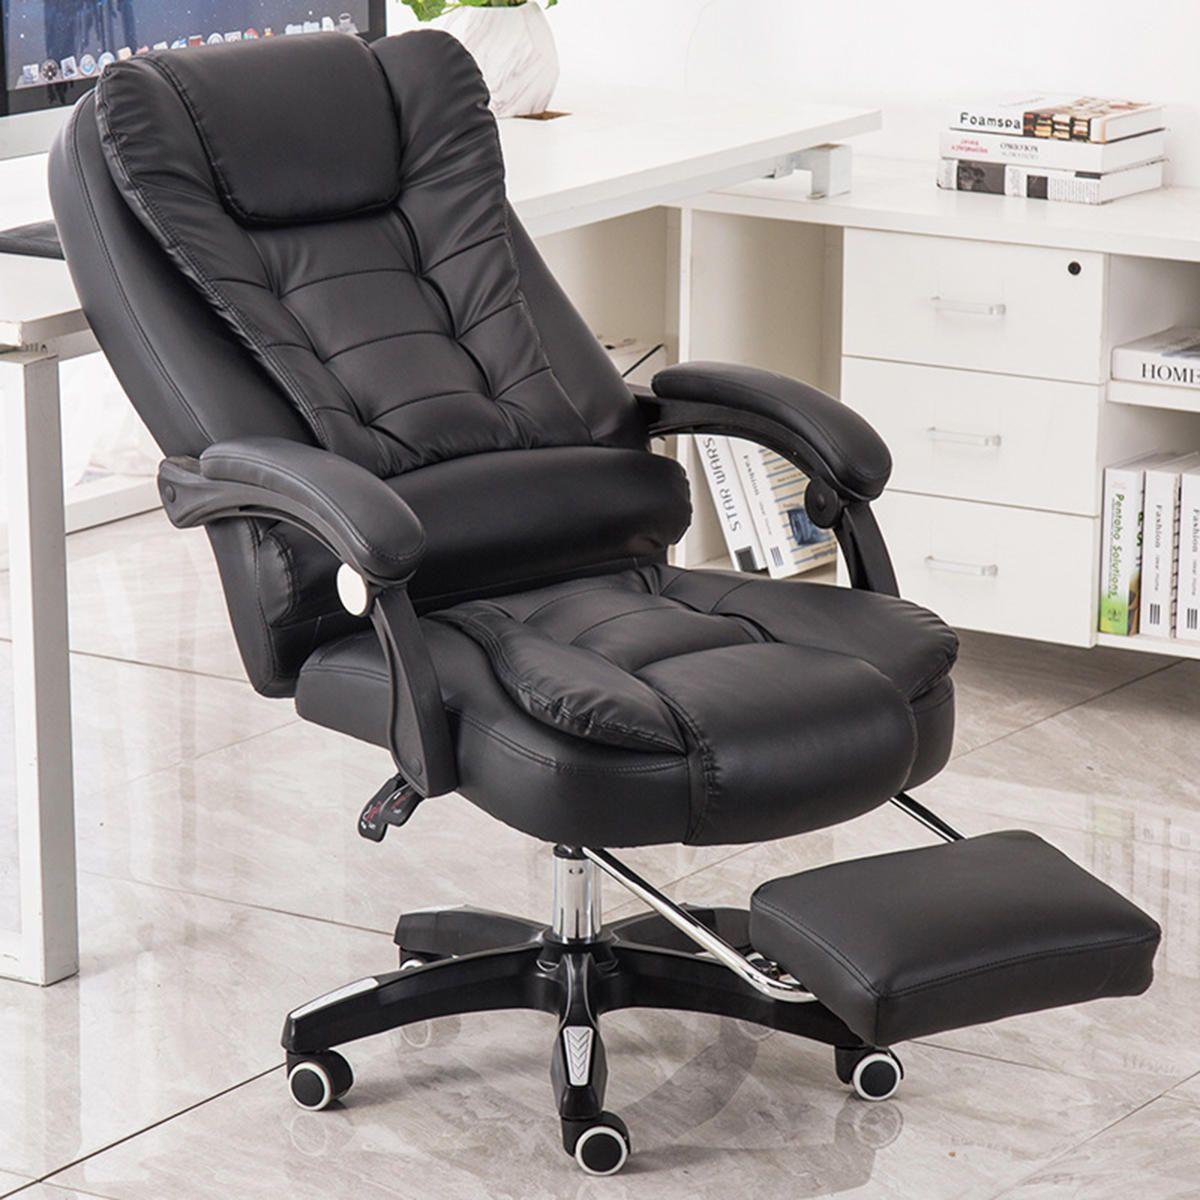 Ergonomic office chair racing gaming chair highback pu